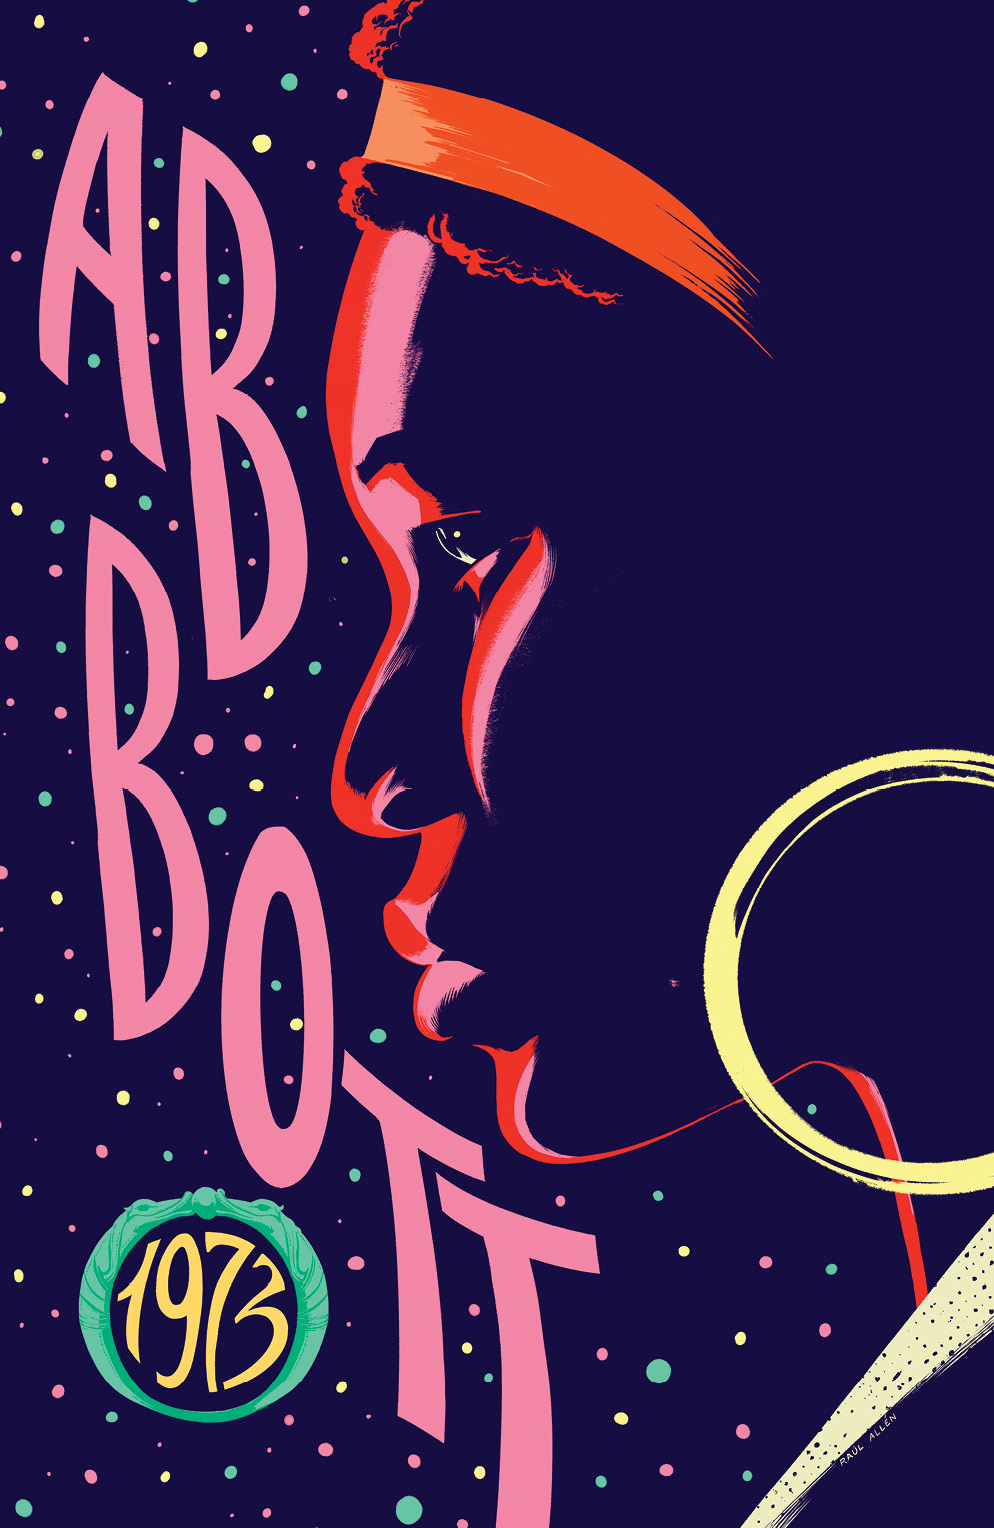 Abbott_1973_001_Cover_B_1970sVariant ComicList: BOOM! Studios New Releases for 01/20/2021